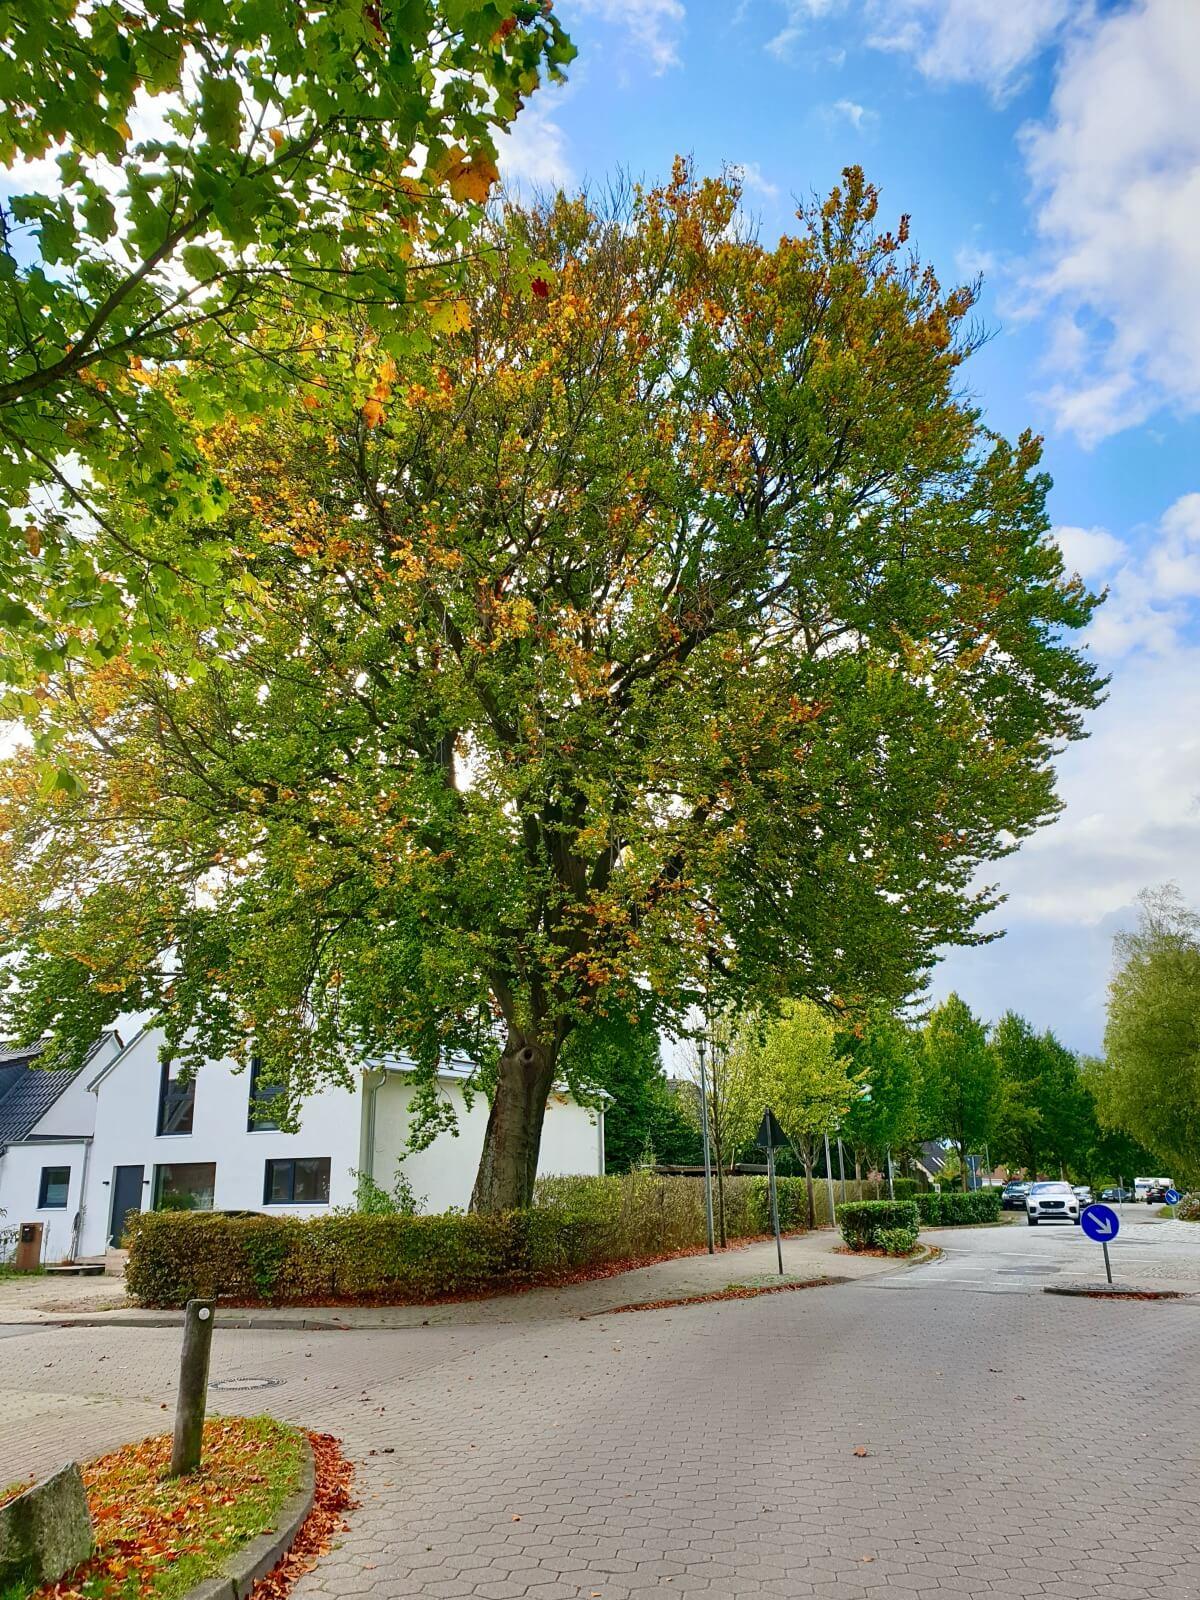 Kreisverkehr Dänenweg / Brauner Hirsch, Ahrensburg – Foto: Nicole Schmidt